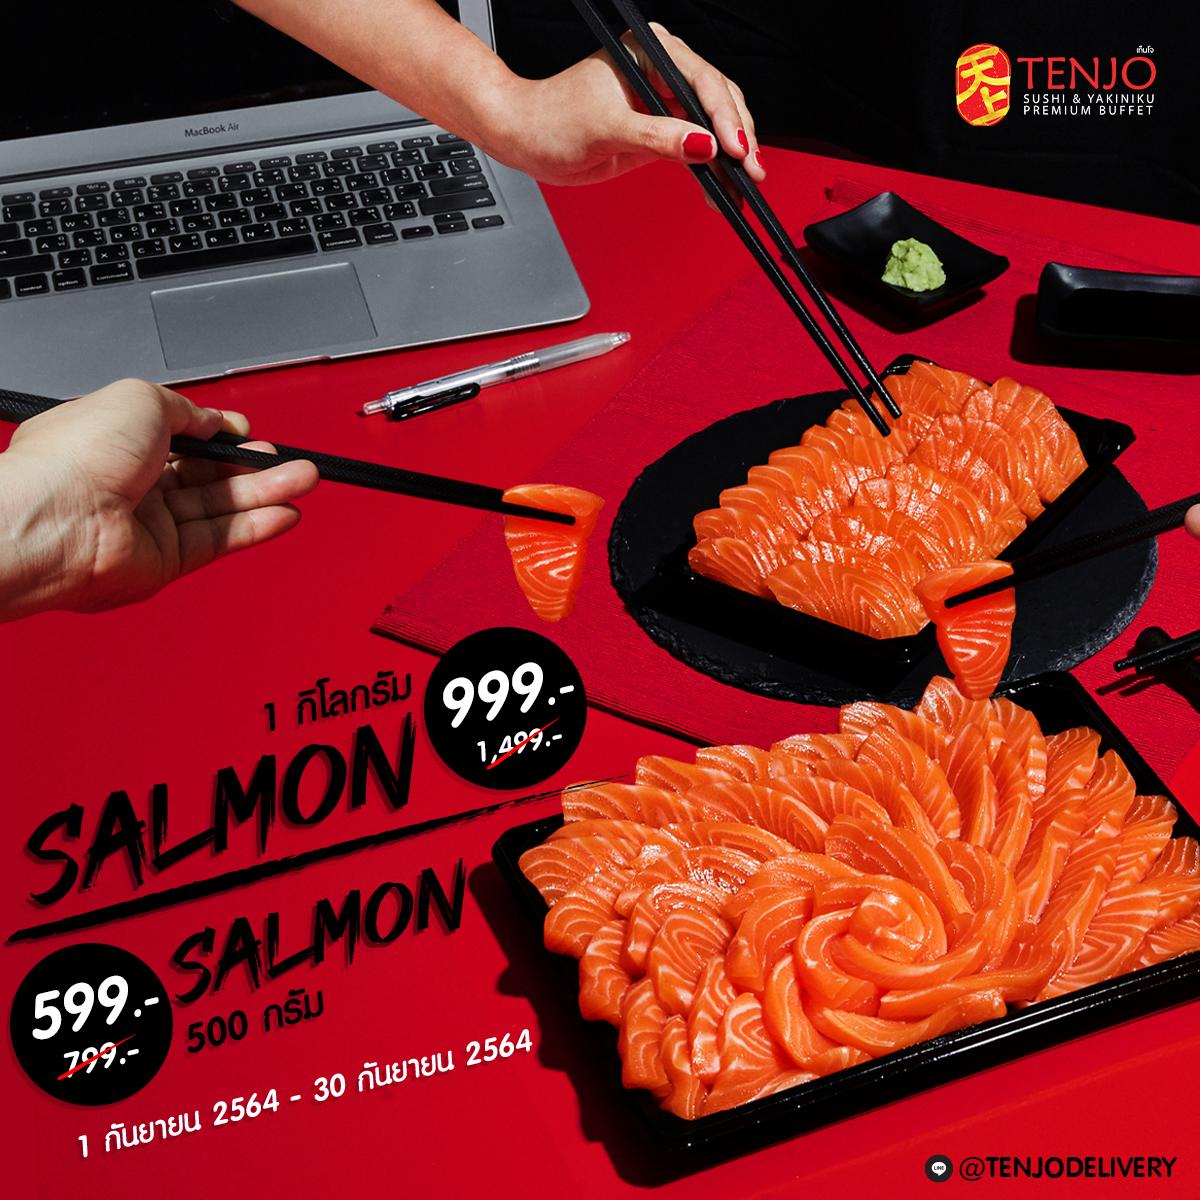 FB_Salmon1kg_500g